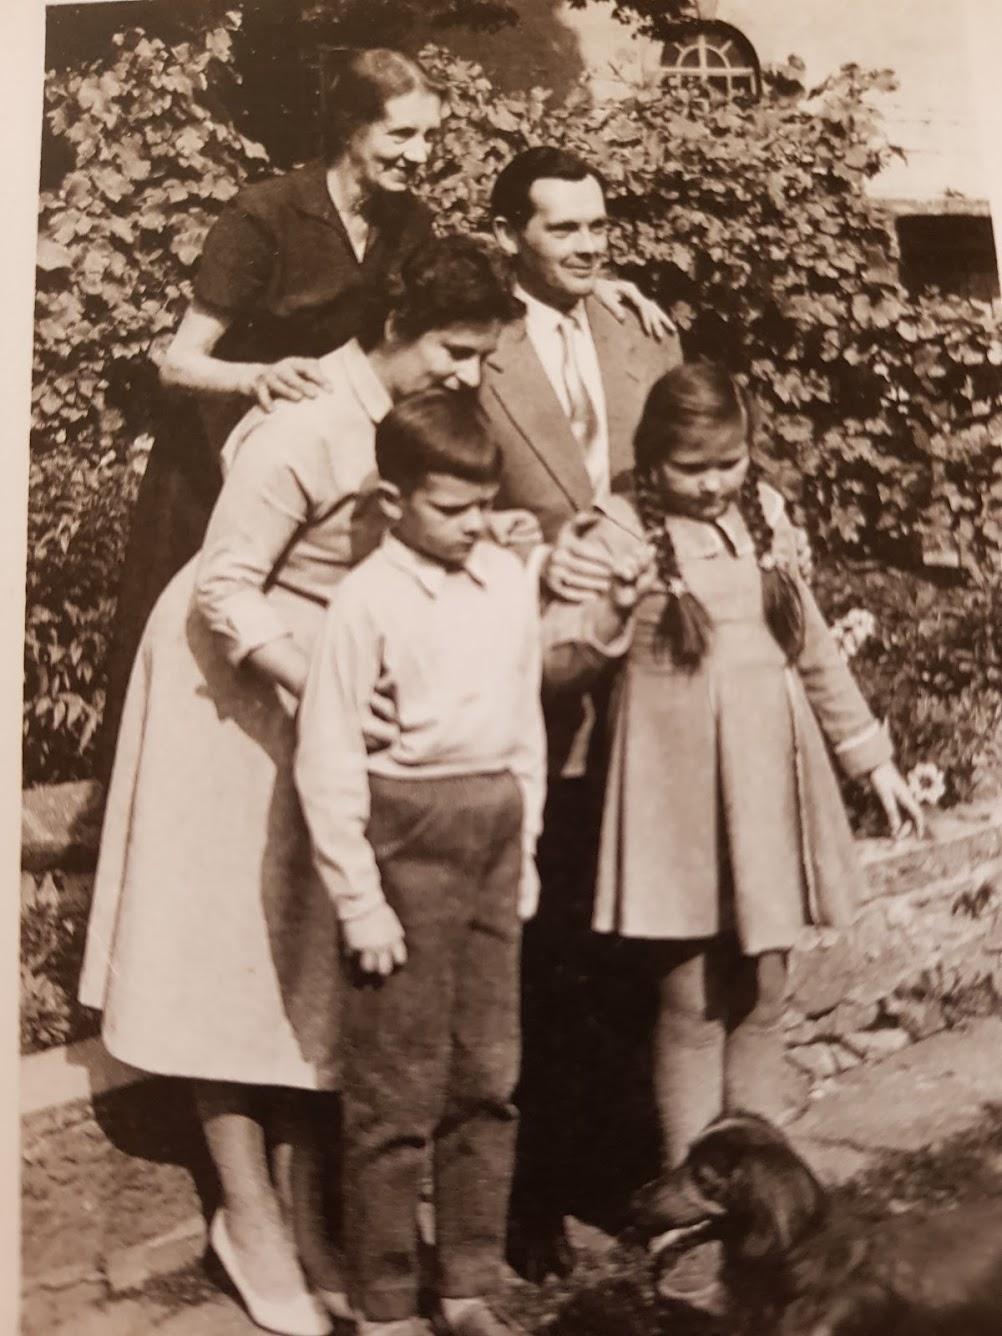 Gisela-Kentmann-Familie-und-Kindheit